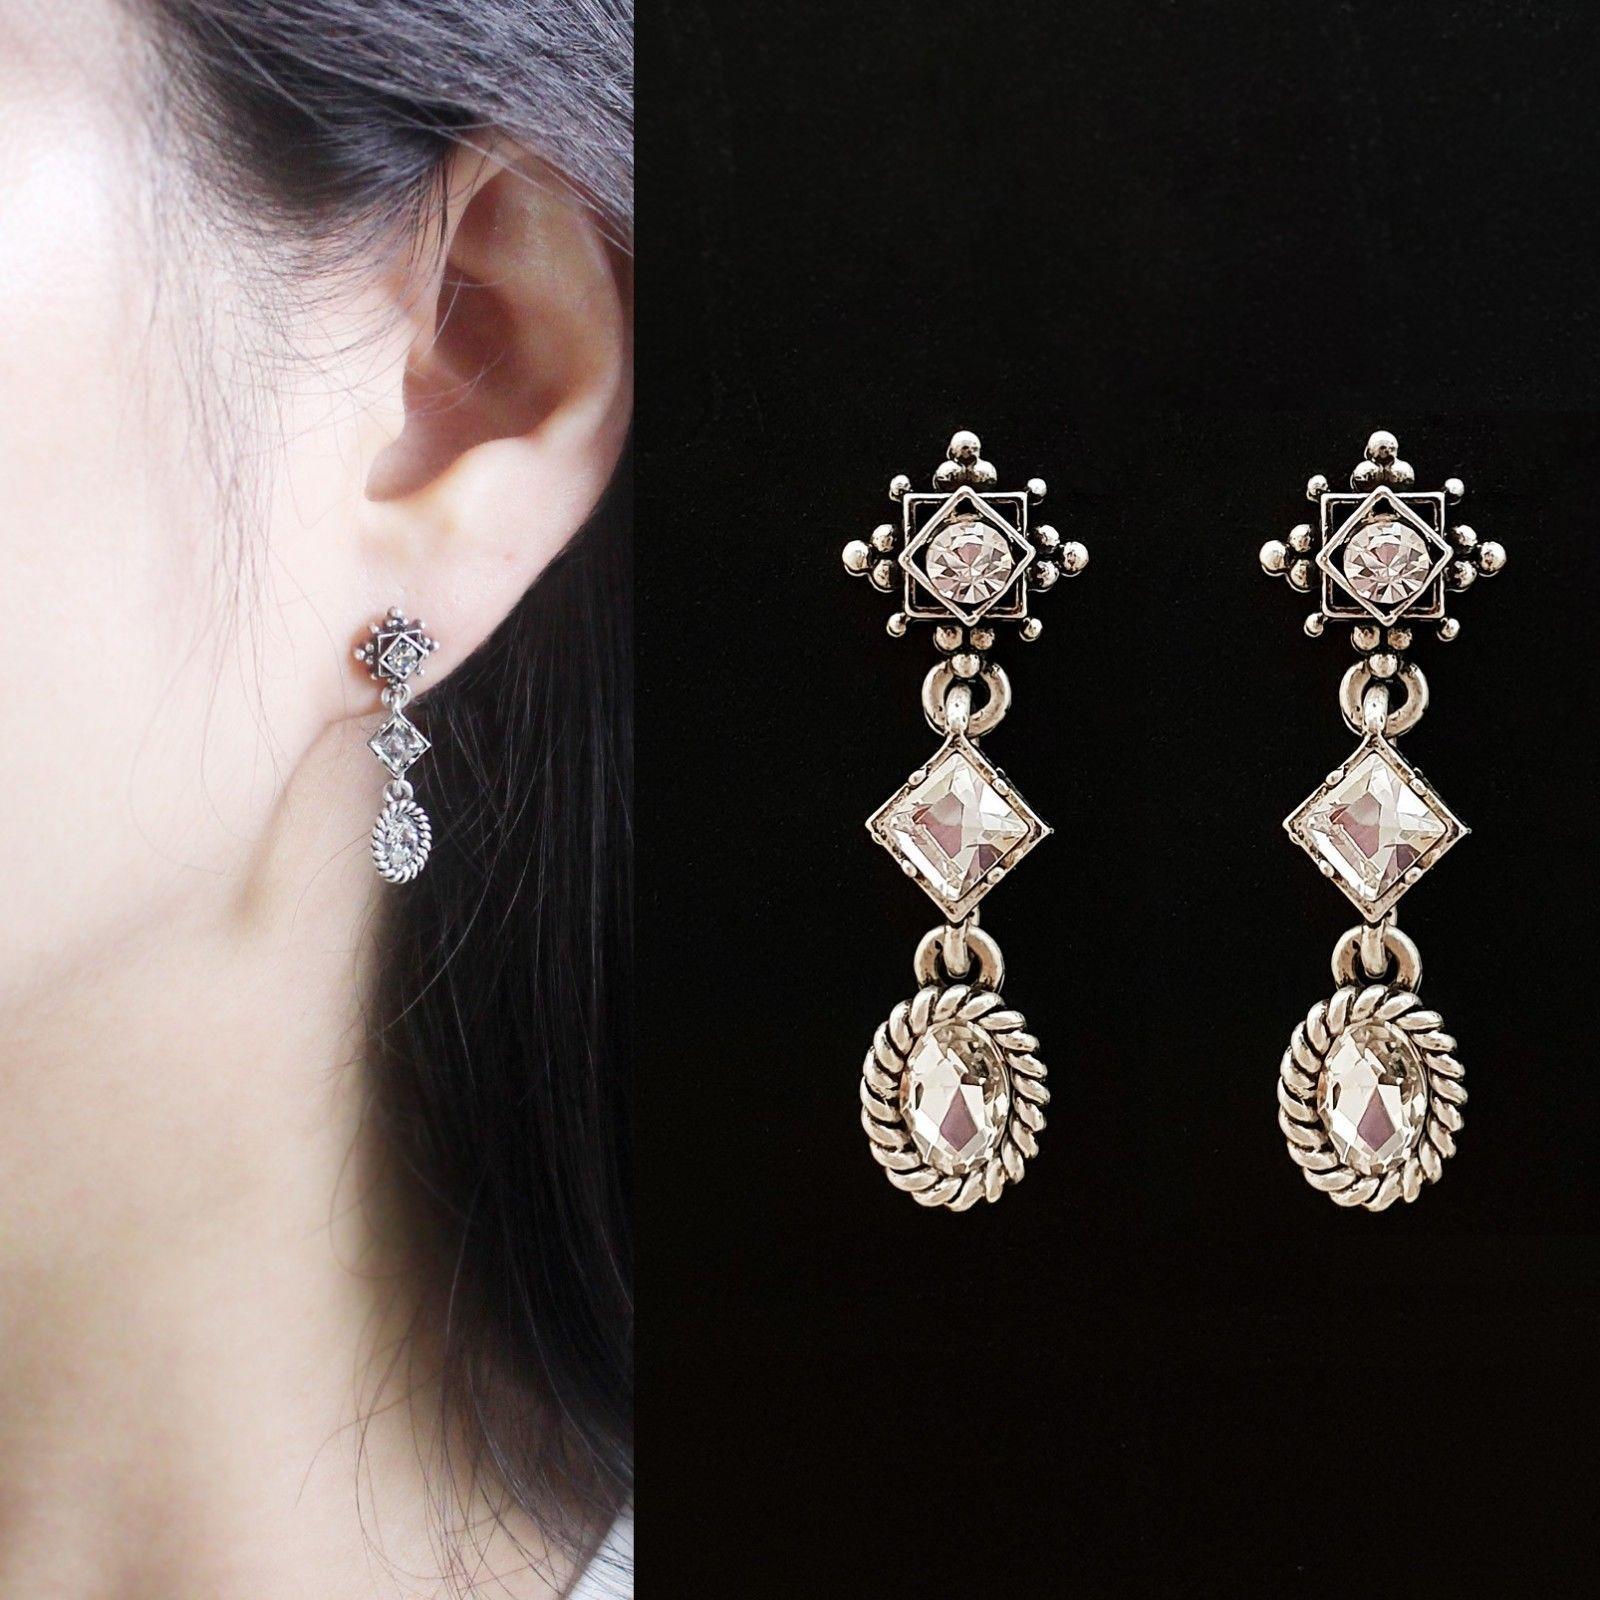 3 Tiered Oval Rhombus Dangle Earrings Made With Swarovski Stone 925 Silver Ear